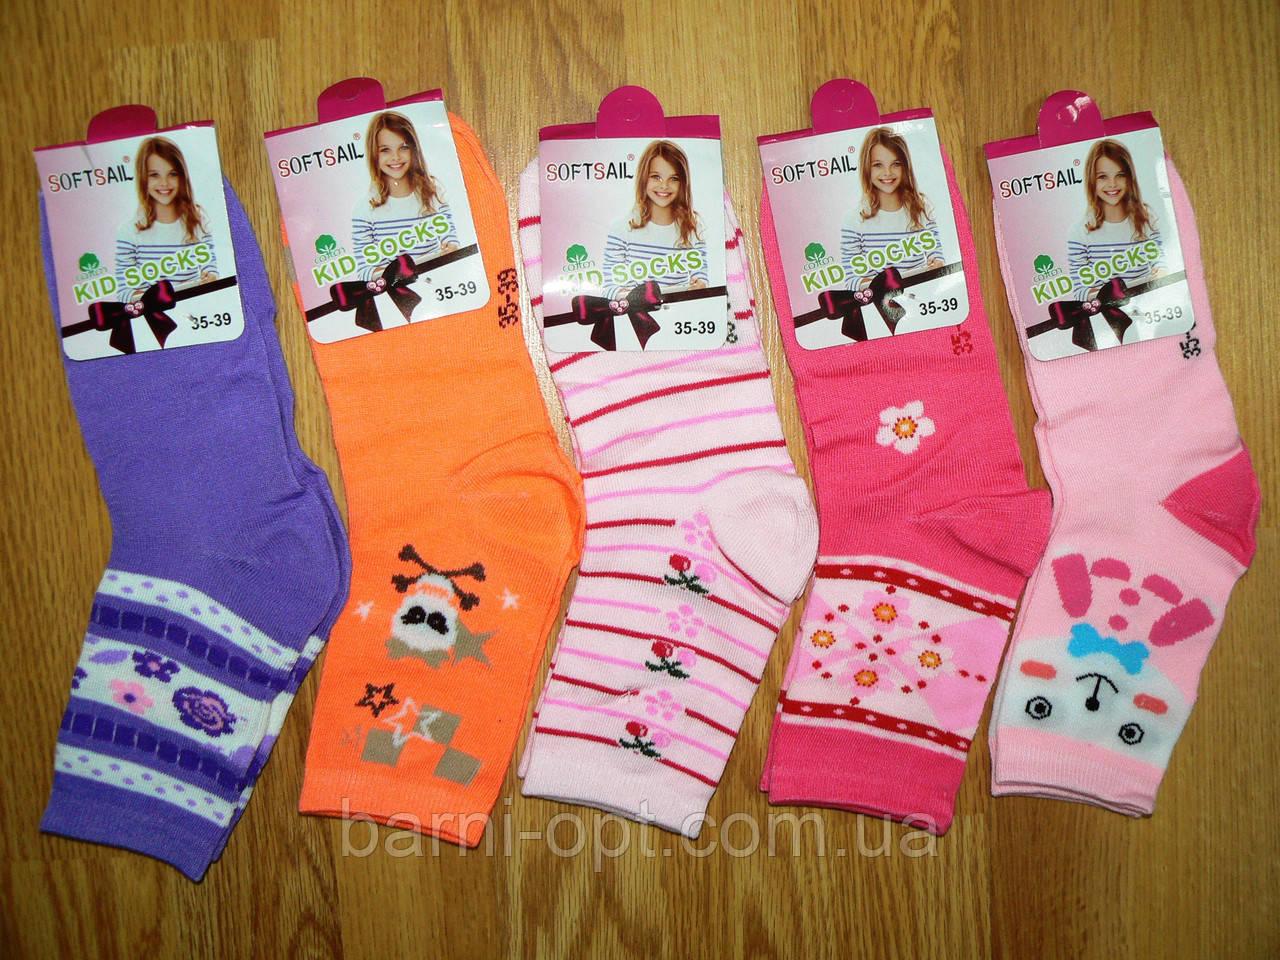 Носочки для девочек оптом, Softsail 32-39 рp.